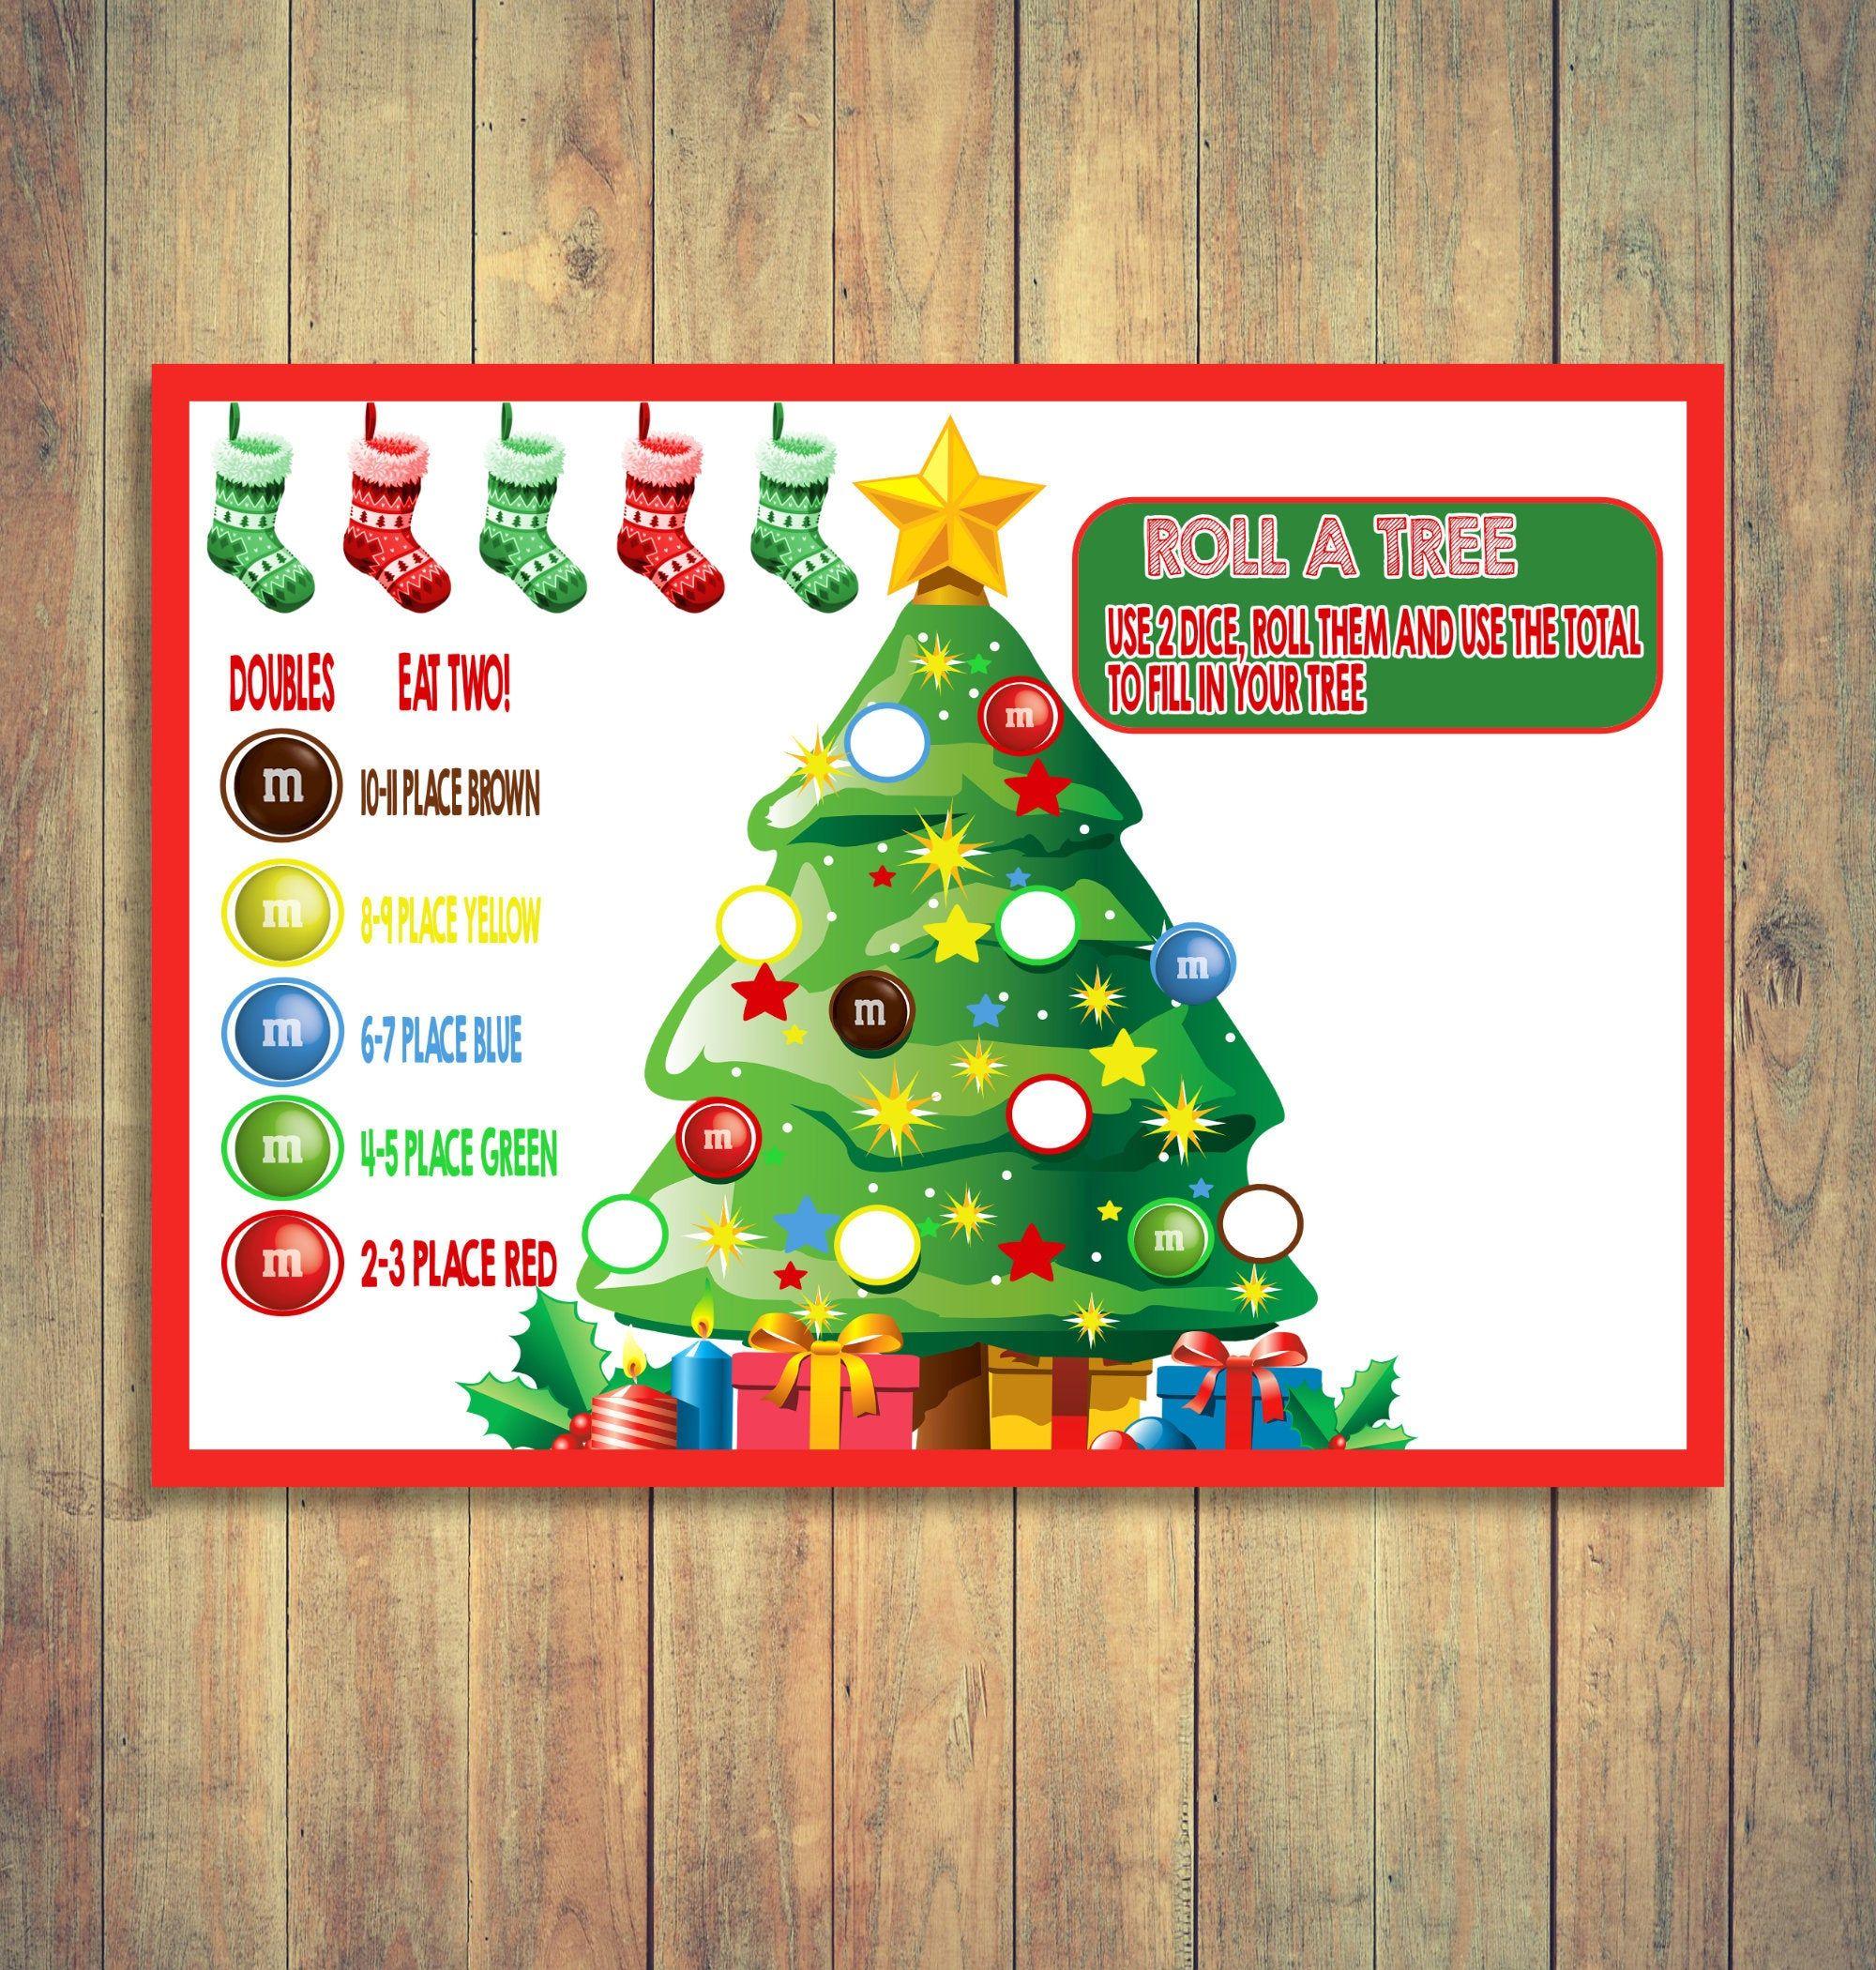 Christmas Kids Table Game Roll A Christmas Tree Game Kids Etsy Christmas Games For Kids Christmas Tree Game Holiday Games